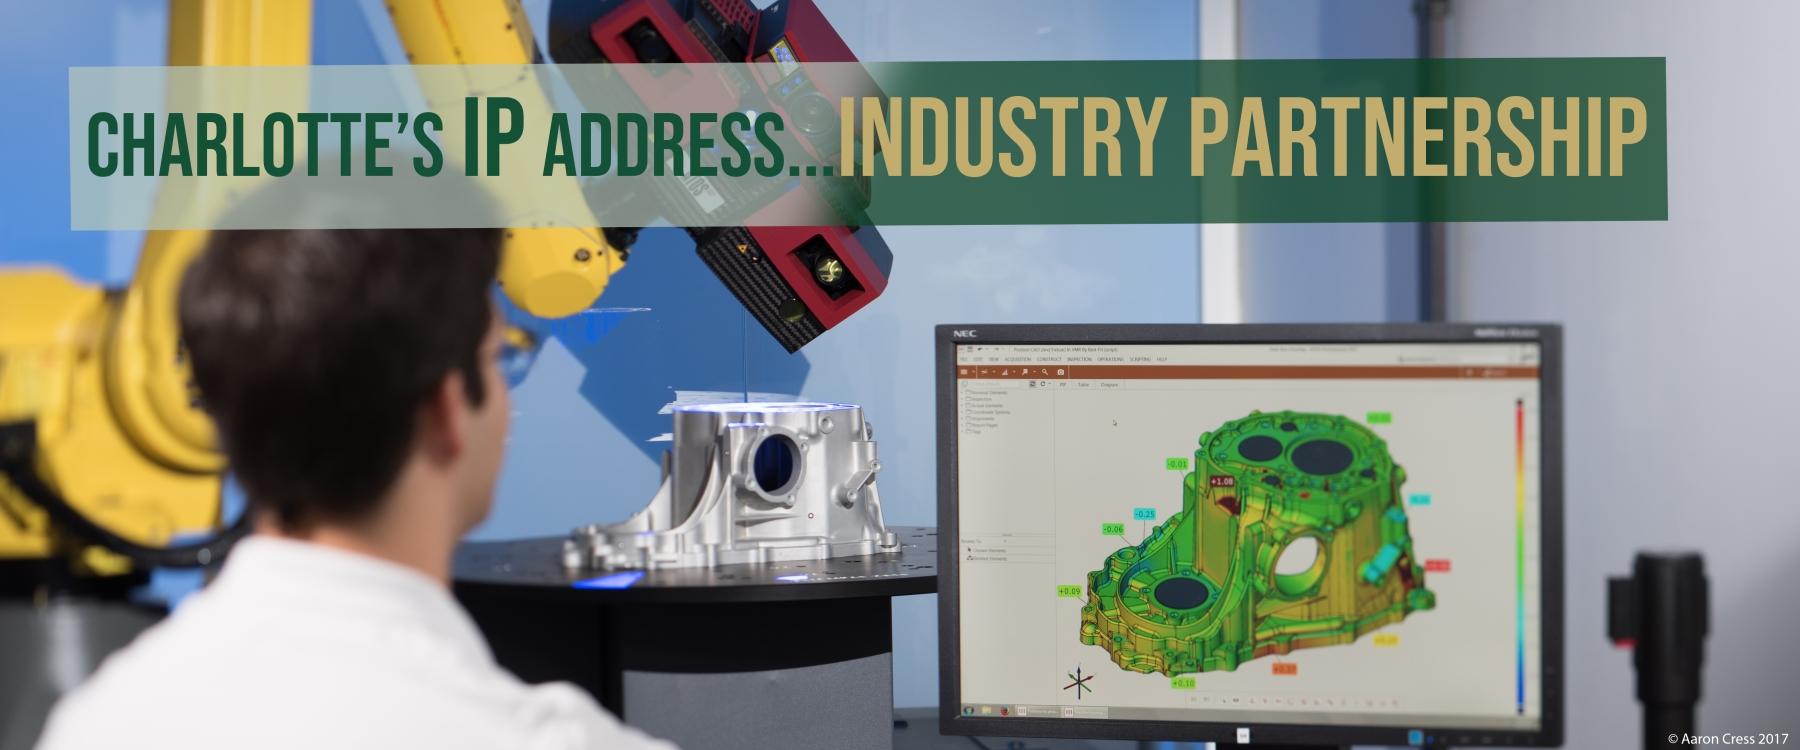 Charlotte's IP Address...Industry Partnership.